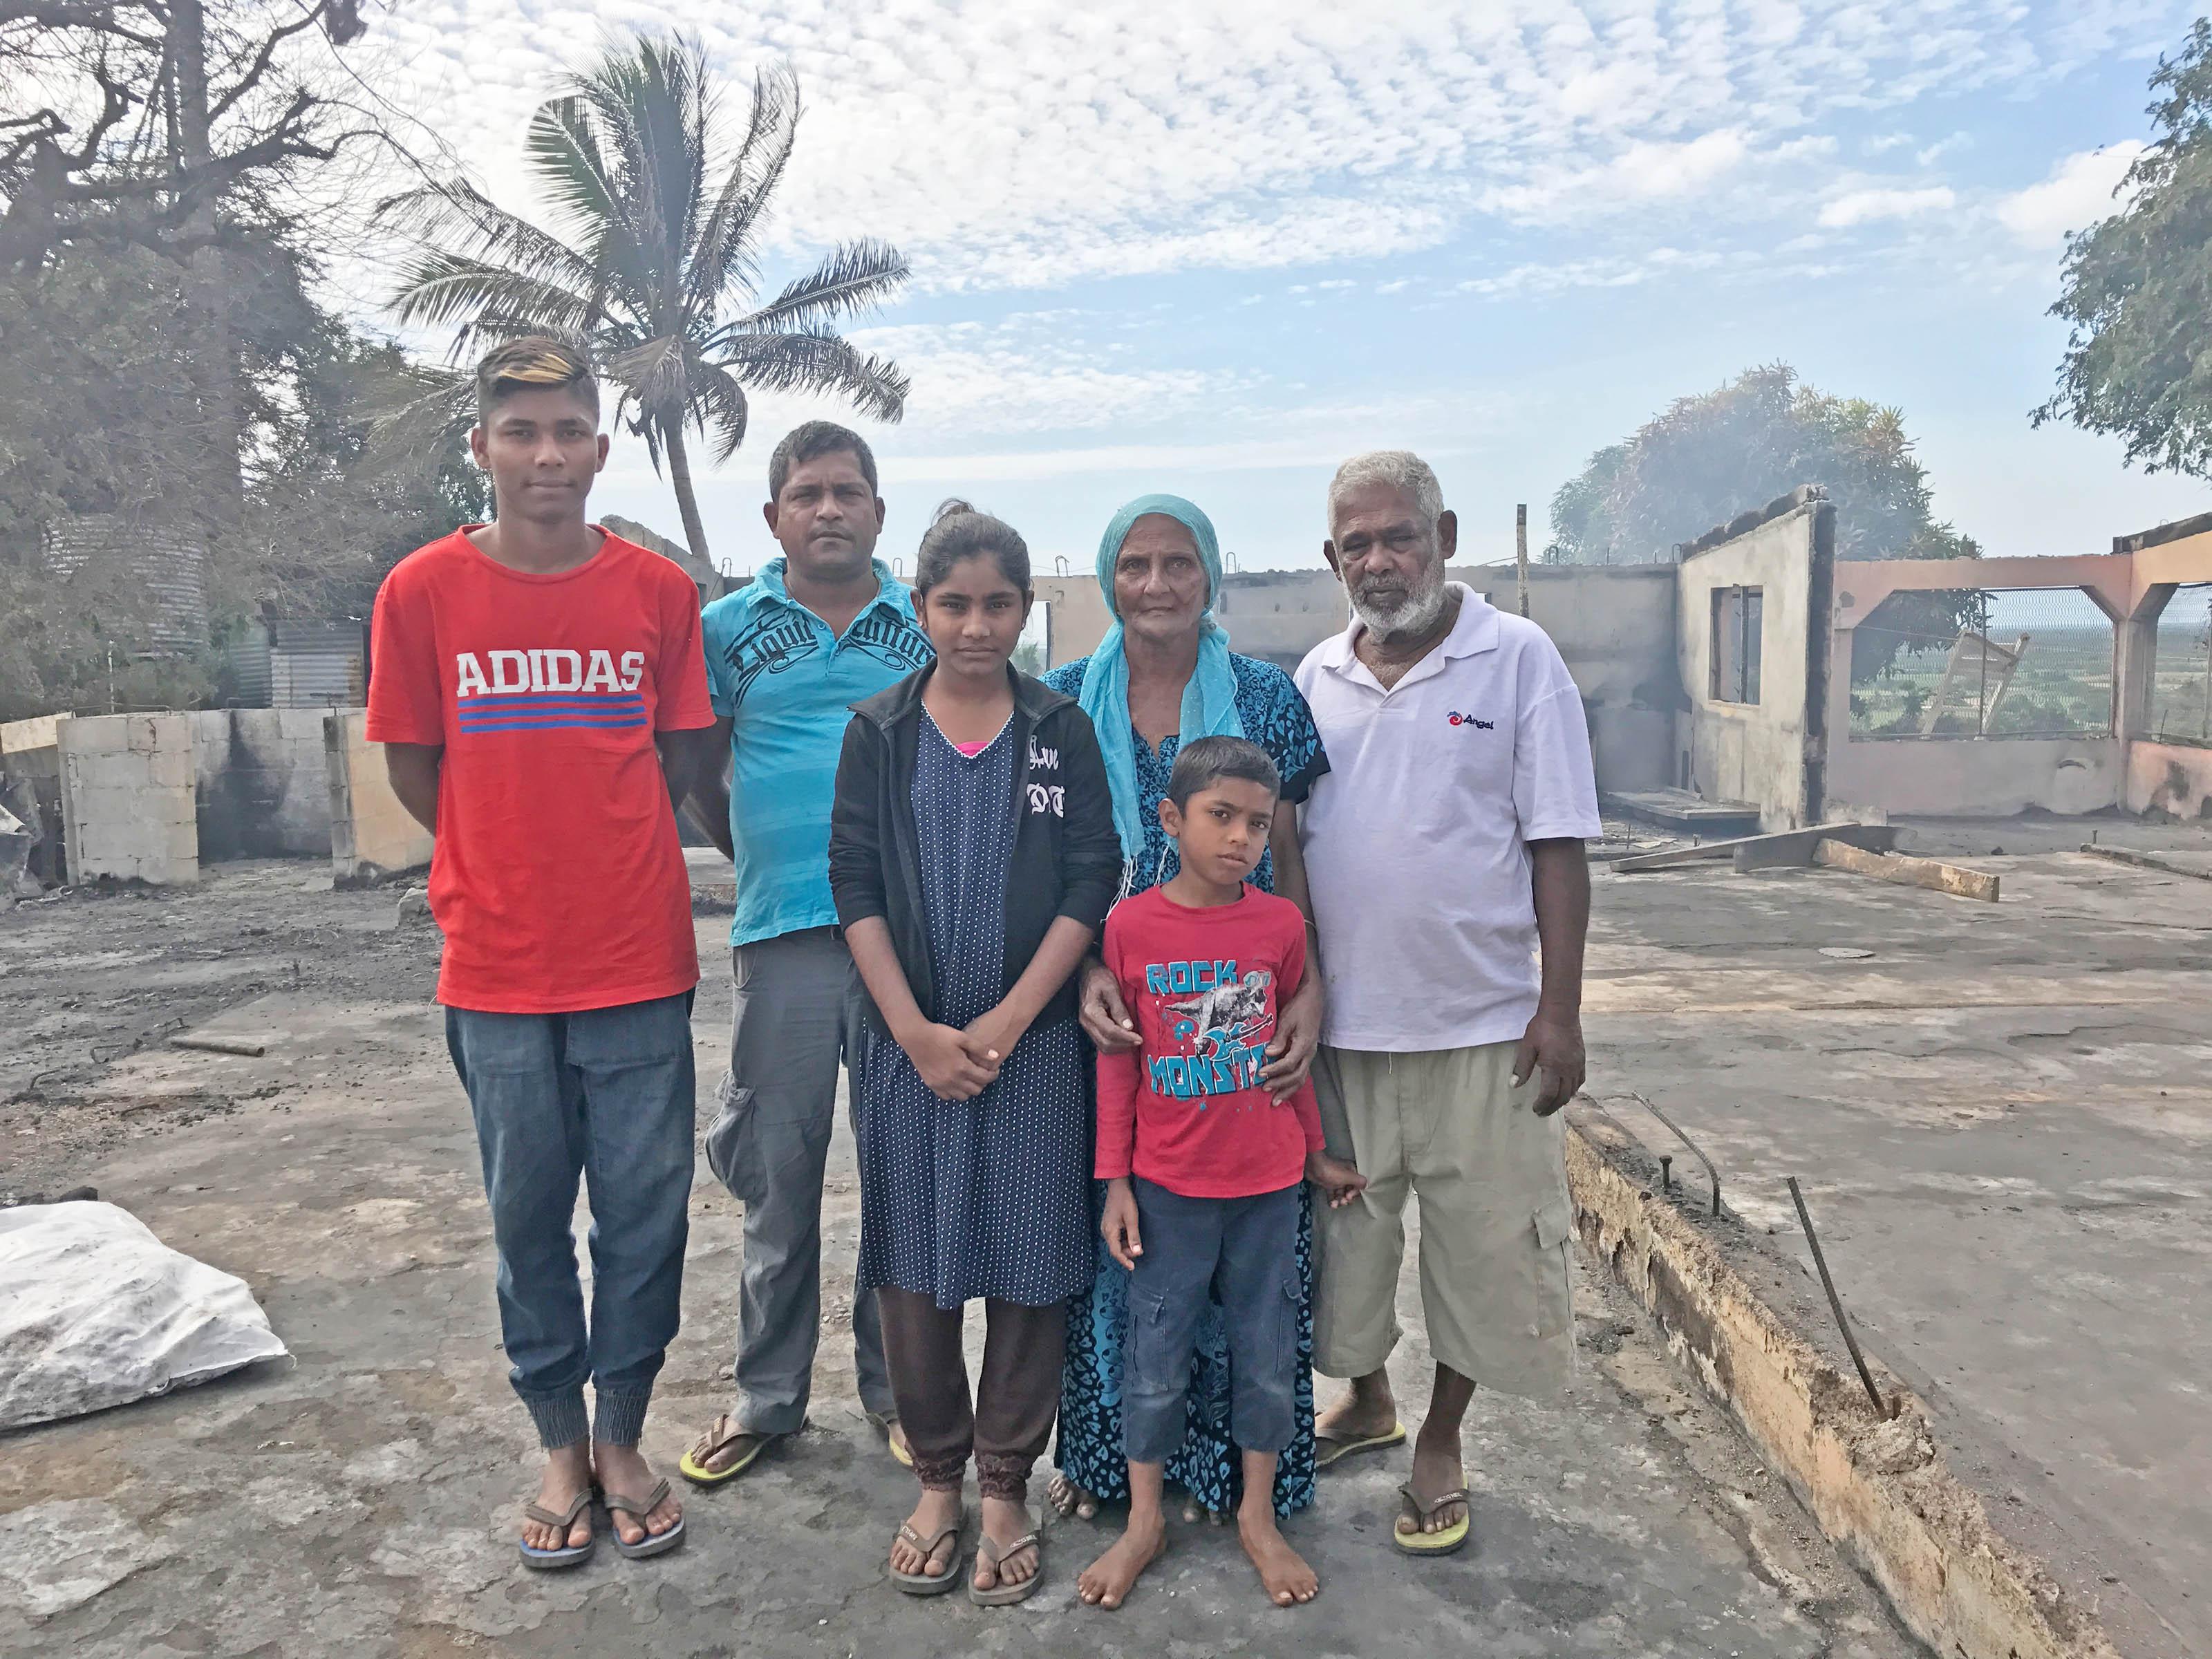 From left: Mohammed Zamir, Mohammed Sahim, Nazila Begum, Mohammed Shafil, Halima Bibi and Abu Bakar in Sarava, Ba, on July 2, 2017. Photo: Anasilini Ratuva